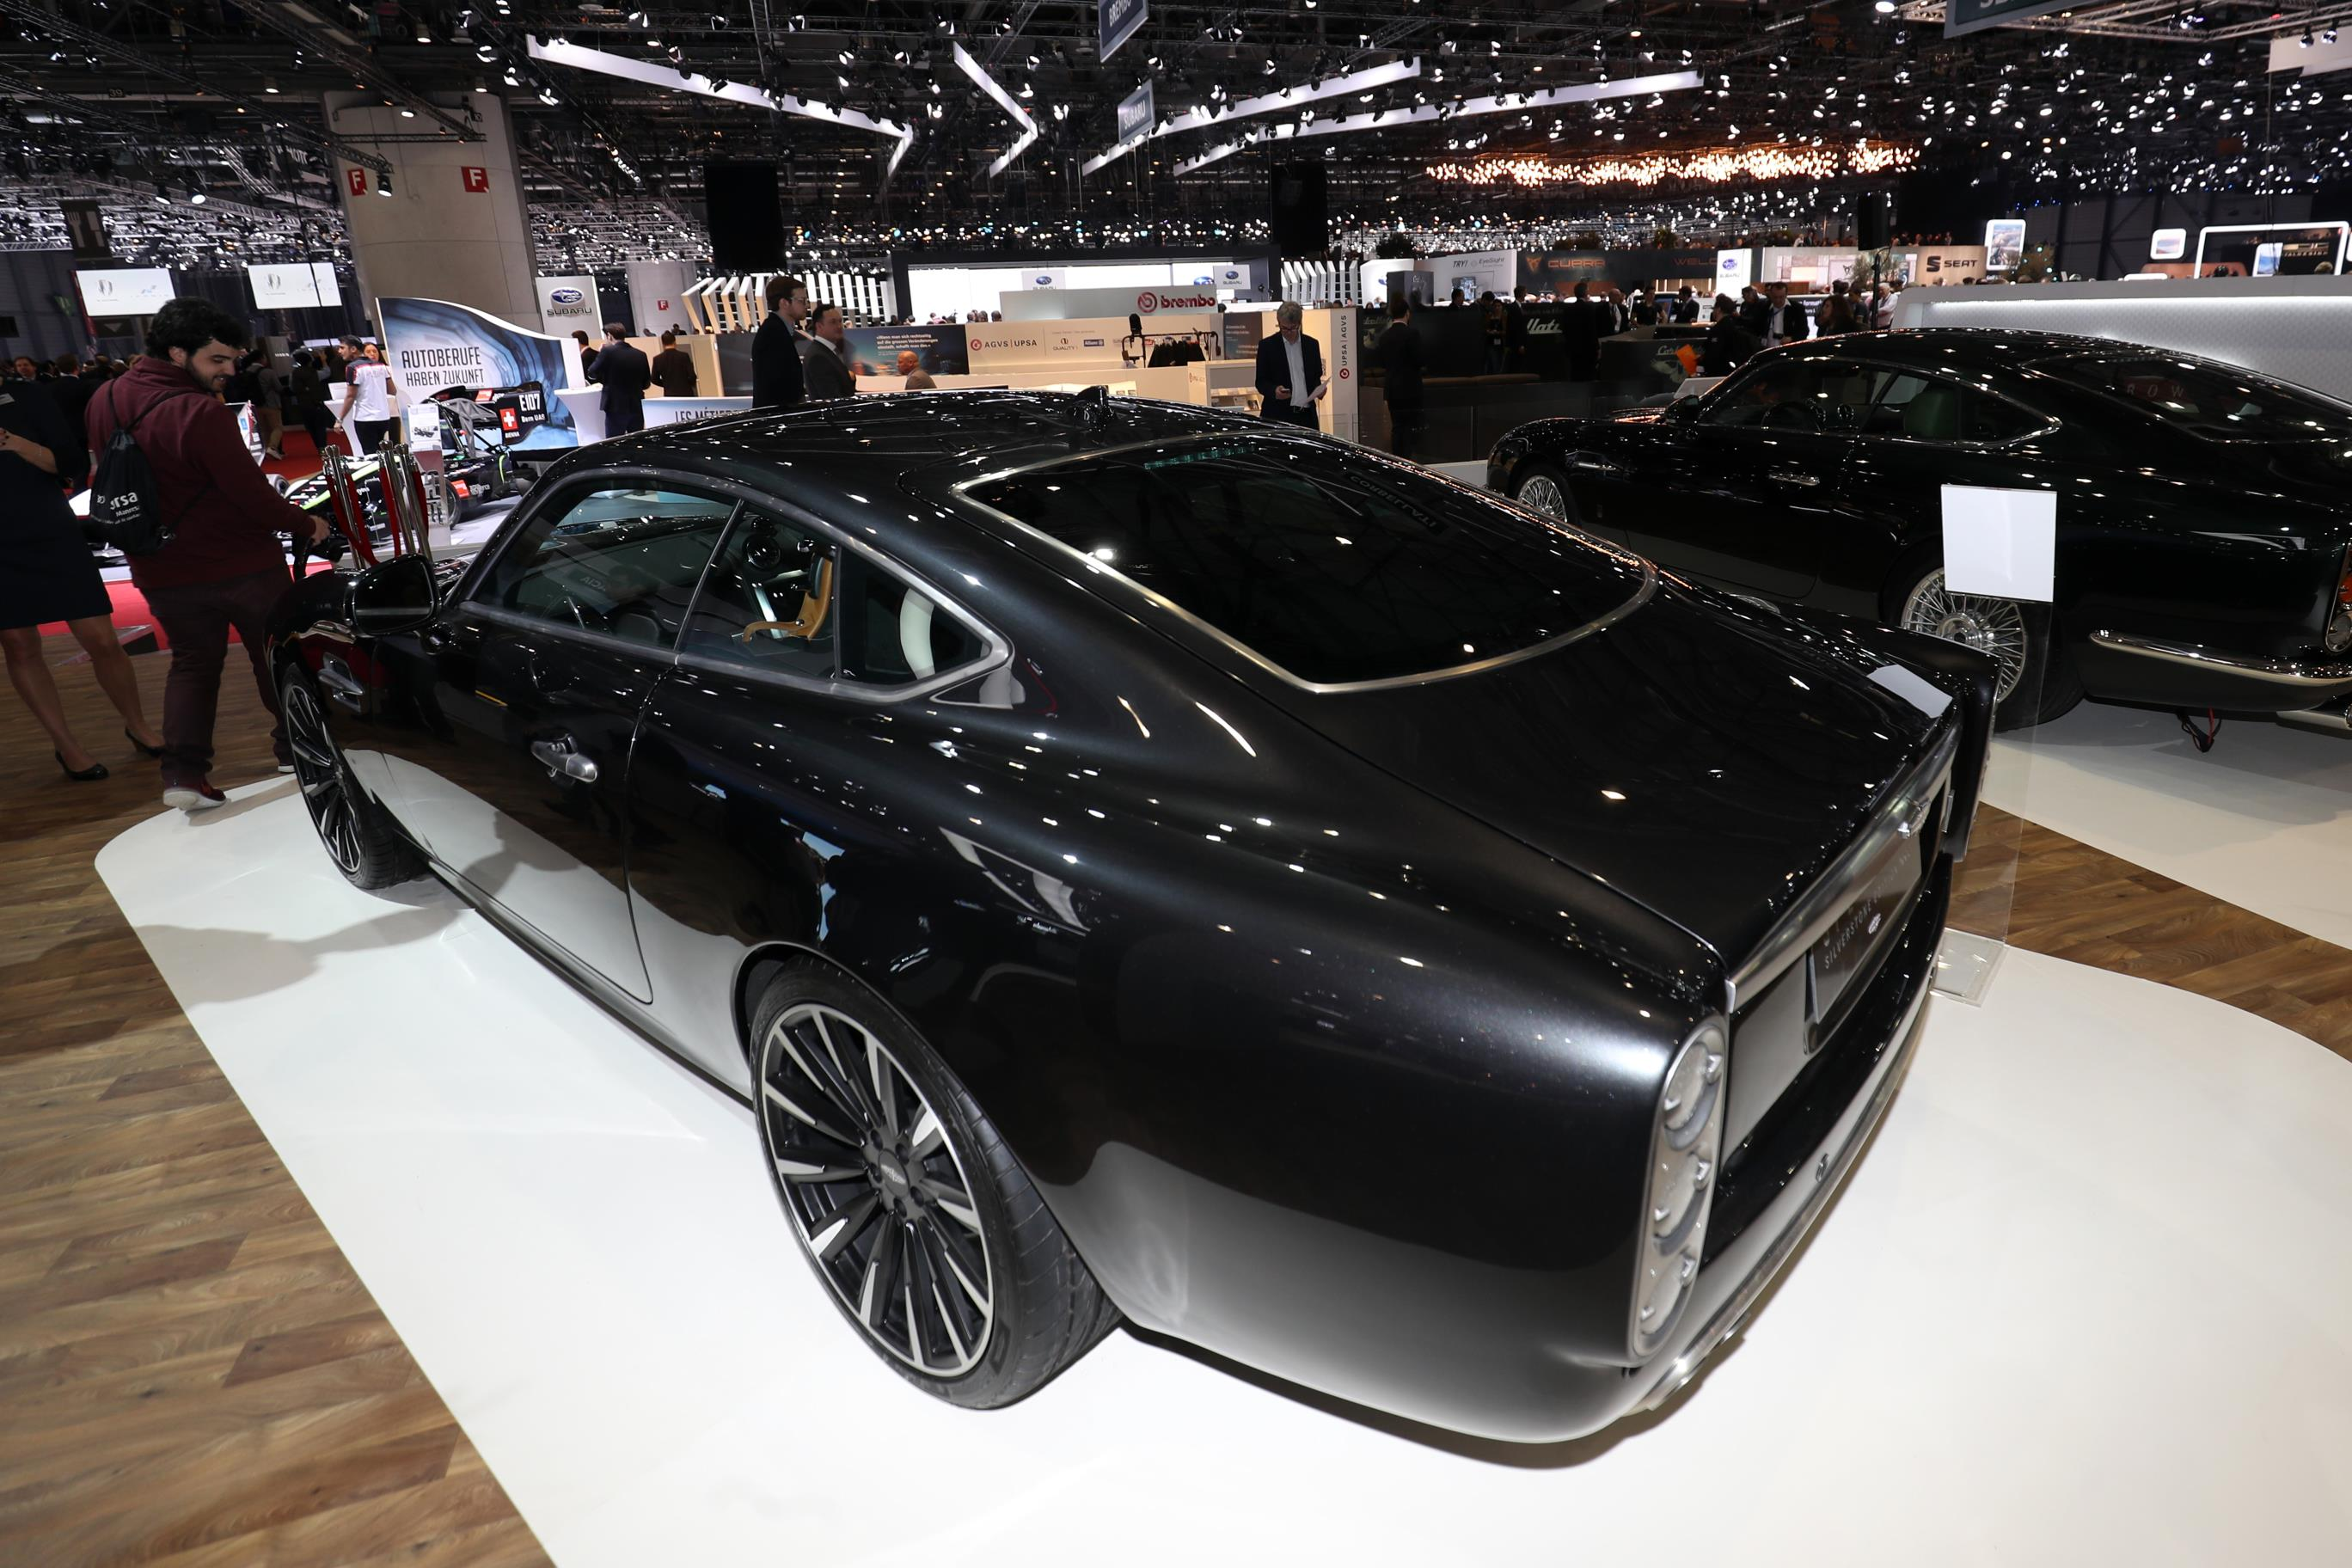 Geneva Motor Show 2018 Mega Gallery Part 1 (202)